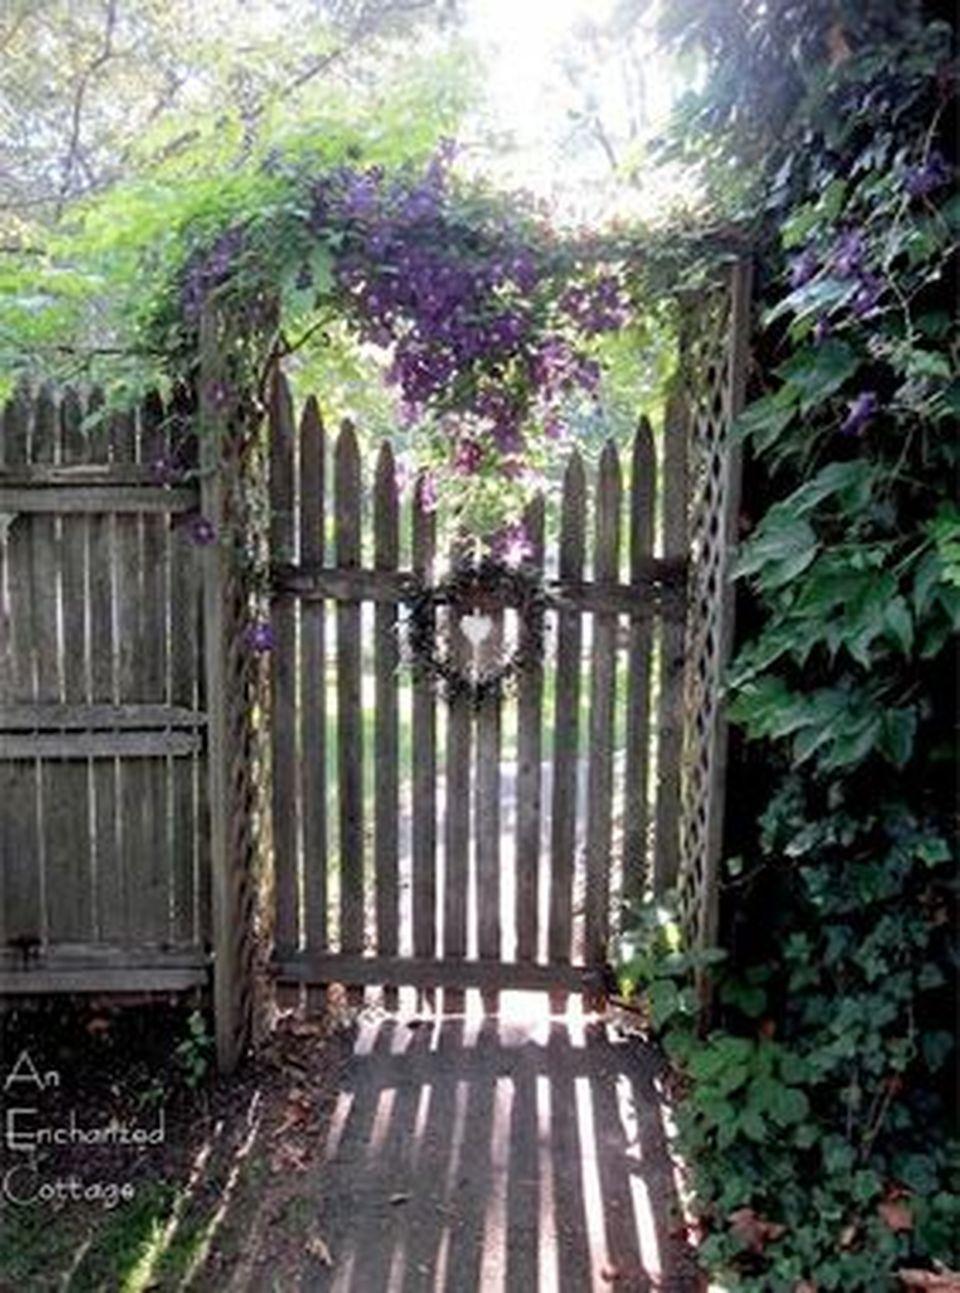 60 Amazing Garden Gates and Fence Design Ideas | Garden ...